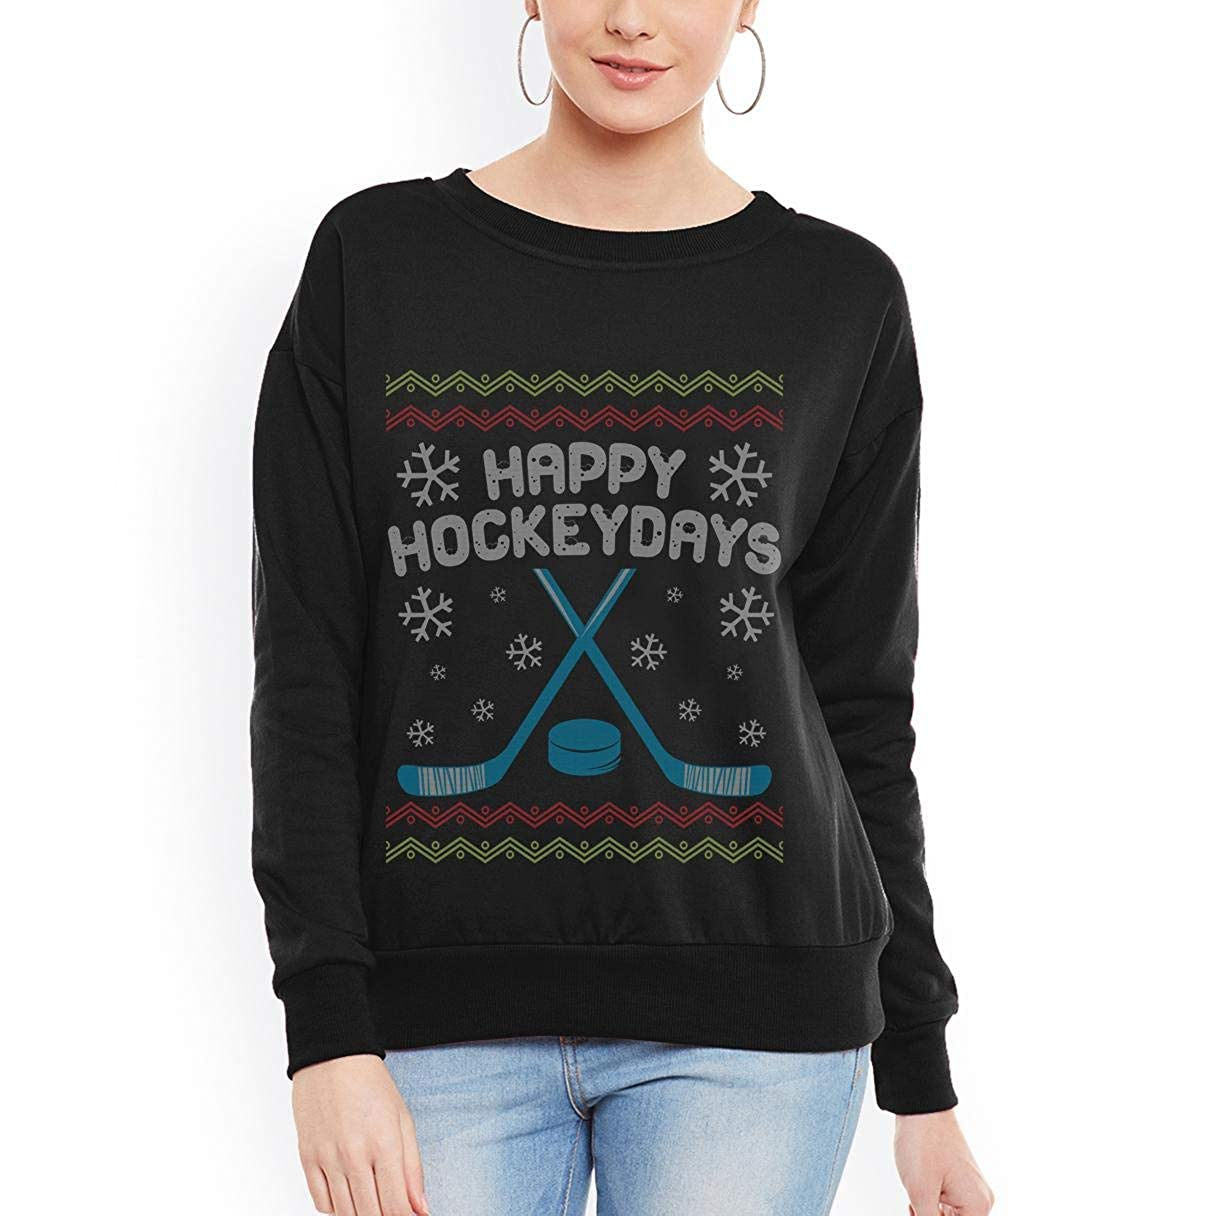 tee Doryti Happy Hockey Days Ugly Christmas Unisex Sweatshirt